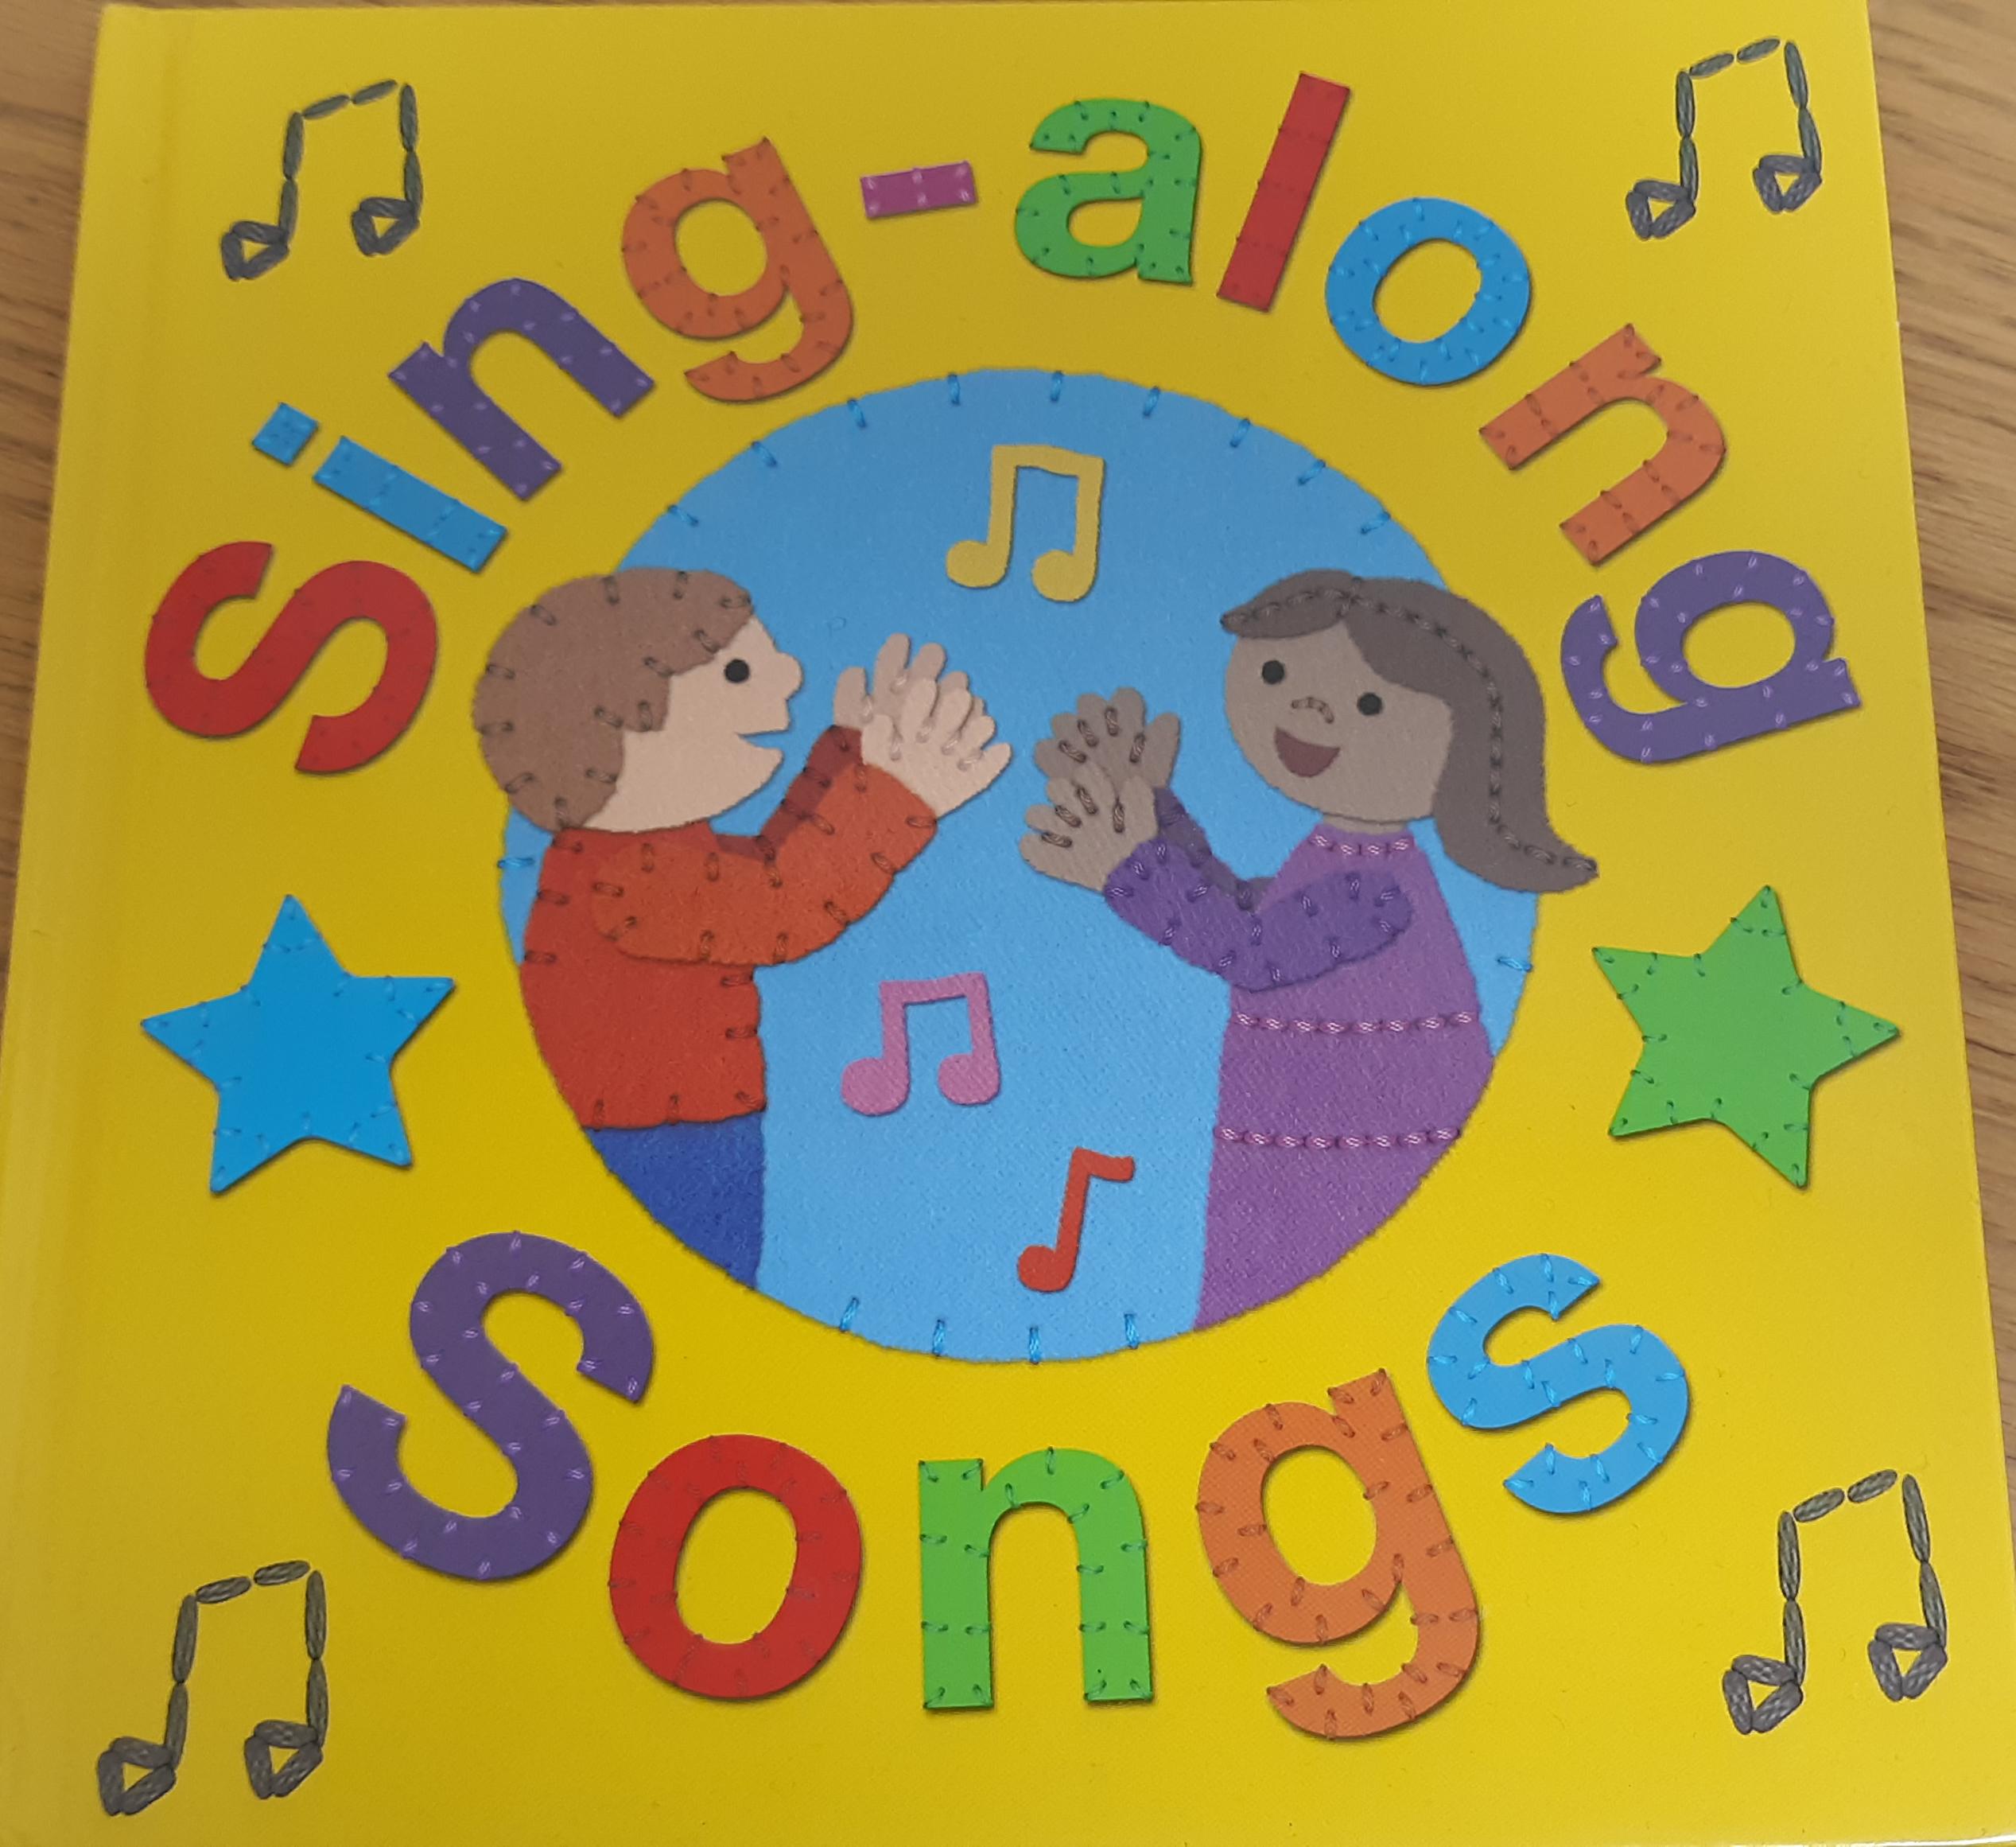 https://0201.nccdn.net/1_2/000/000/15b/6cf/sing-along-songs.png